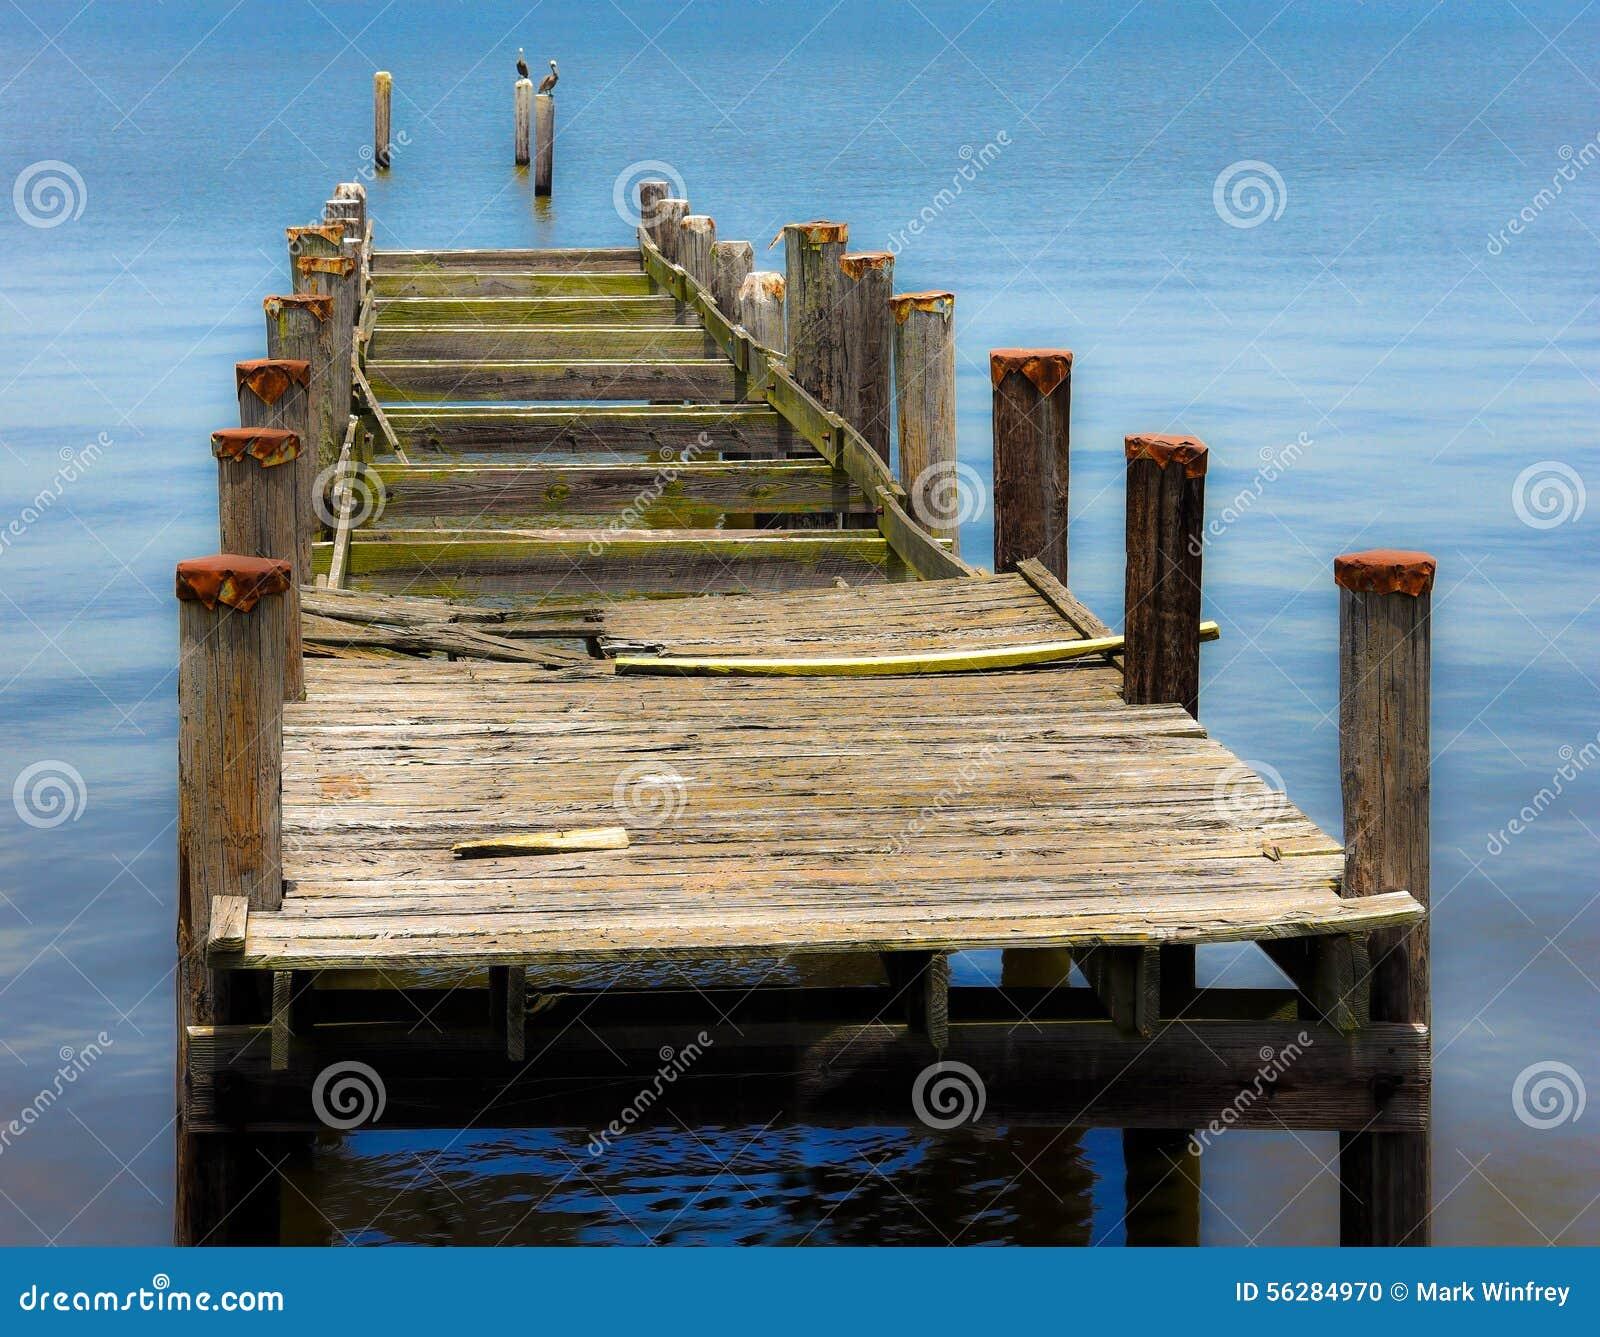 Old Boat Dock Stock Photo - Image: 56284970